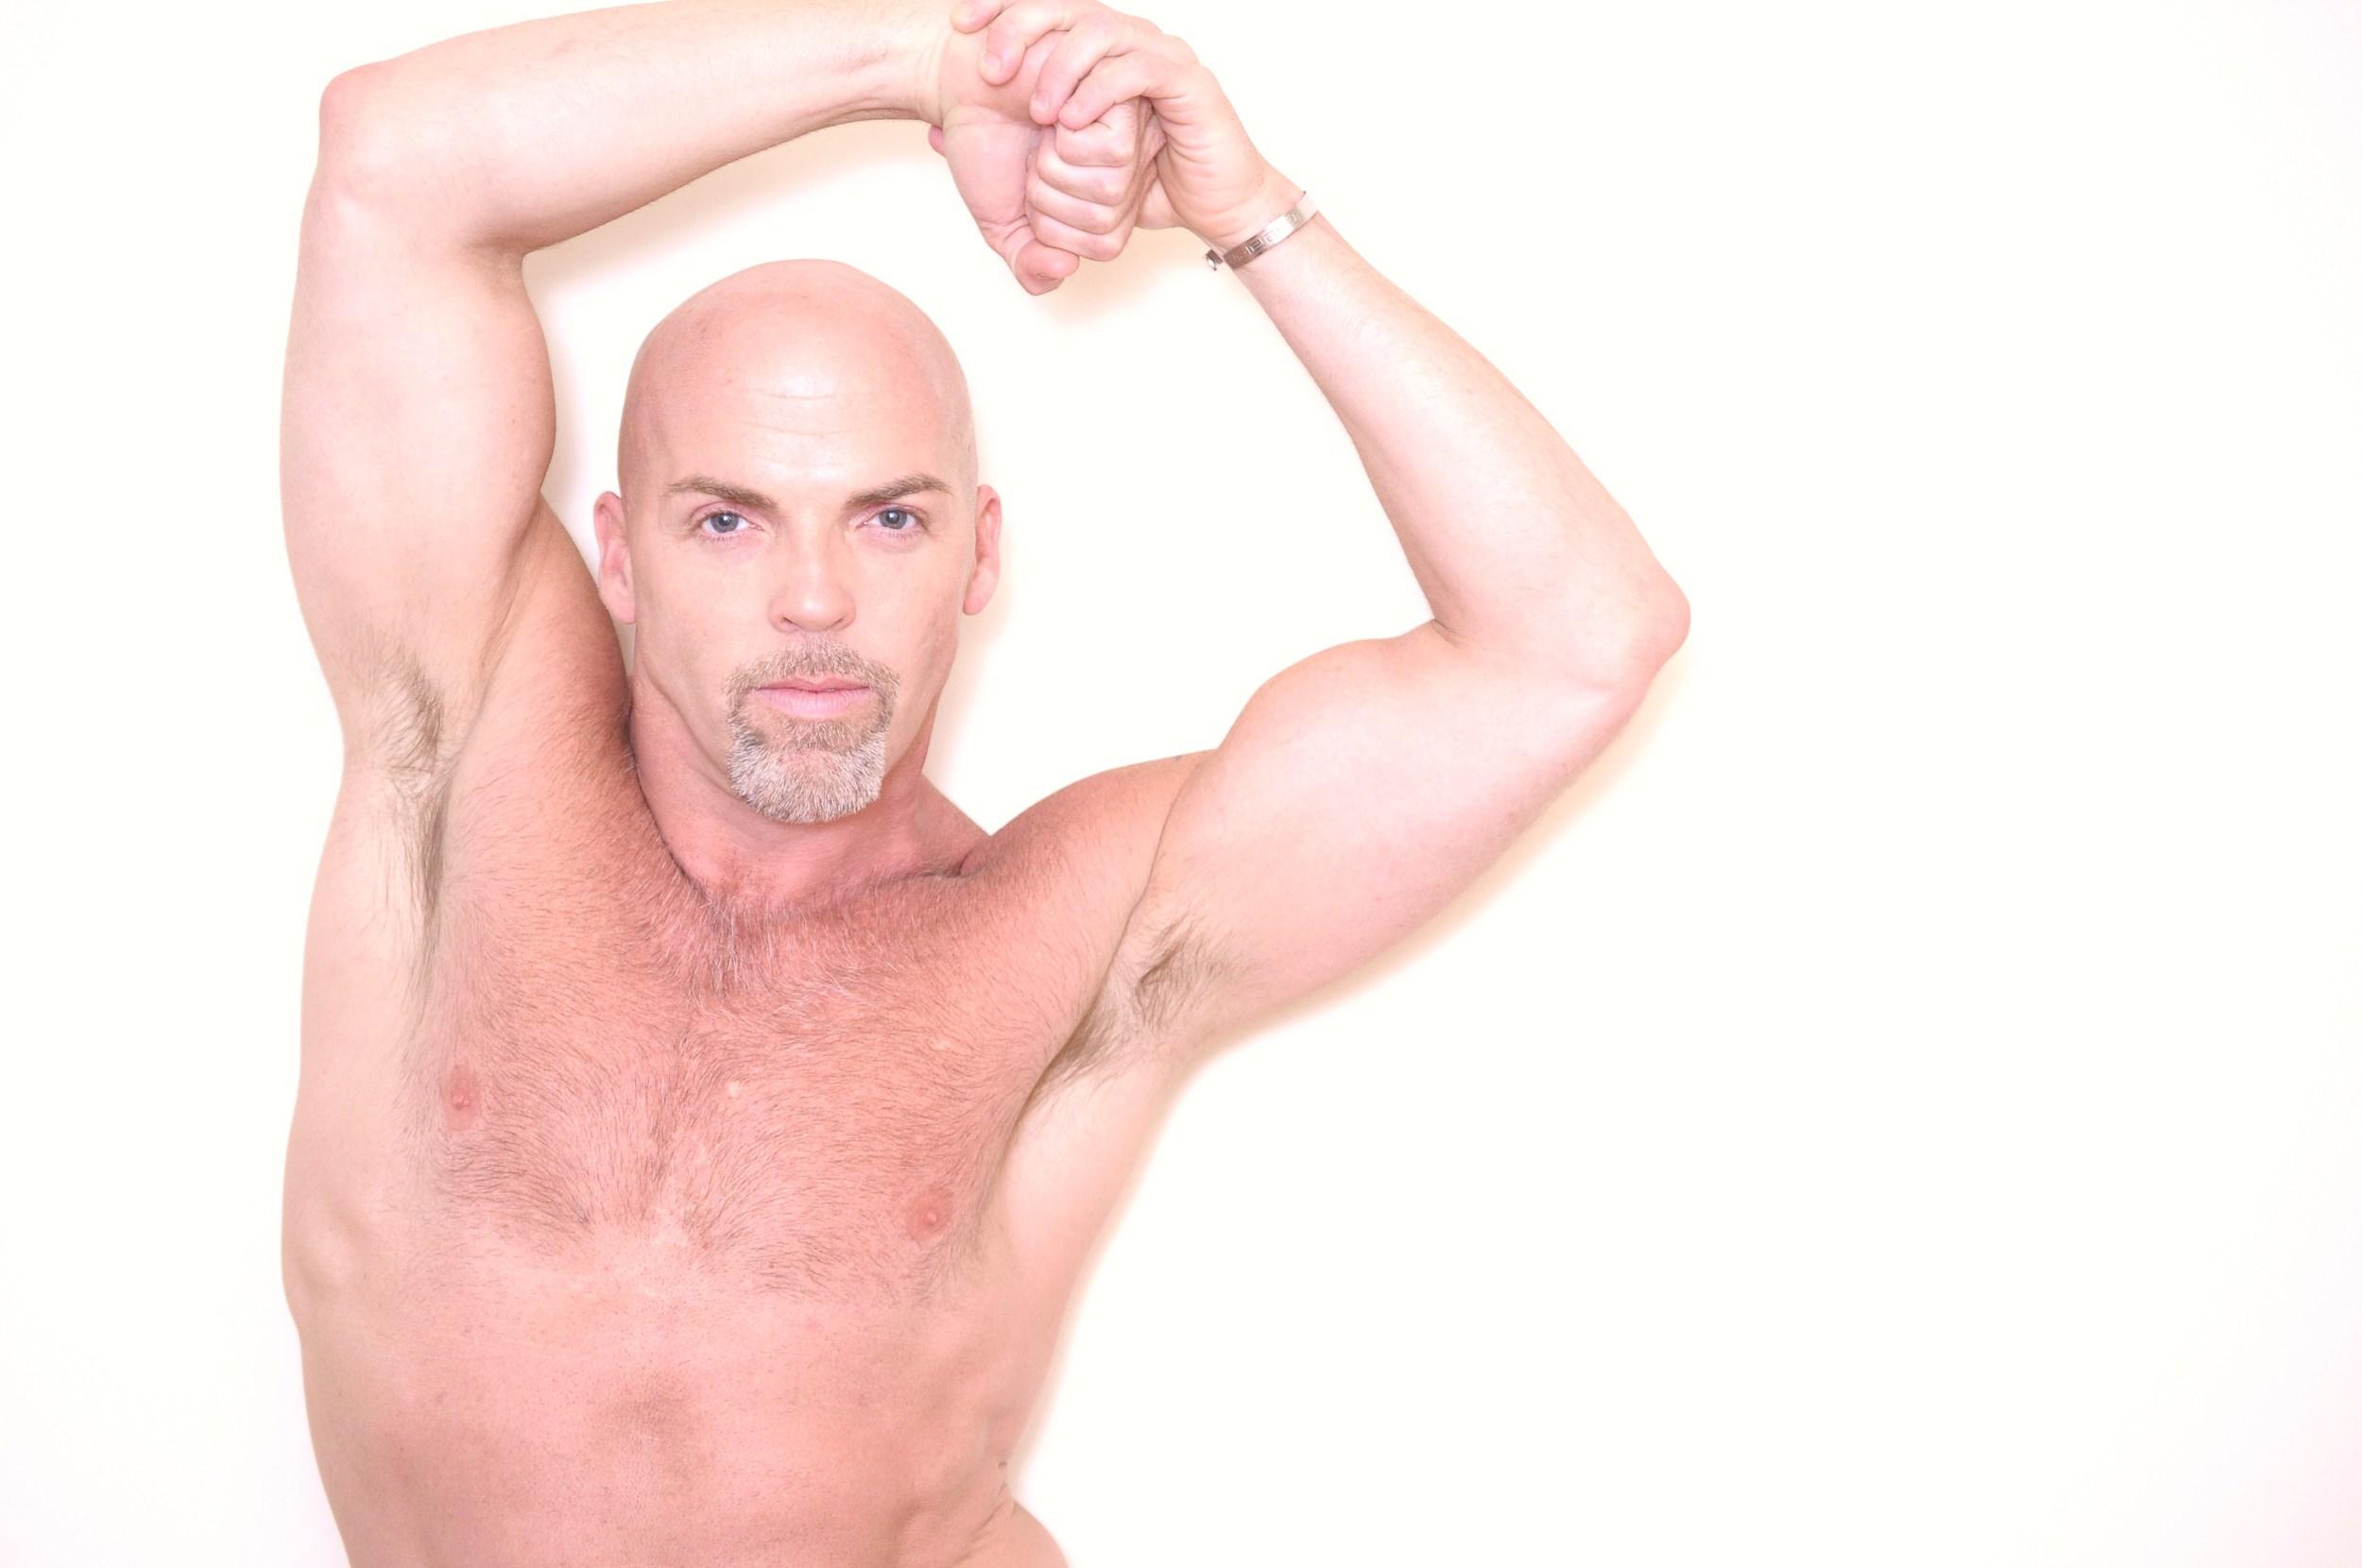 bodyshot arms.JPG